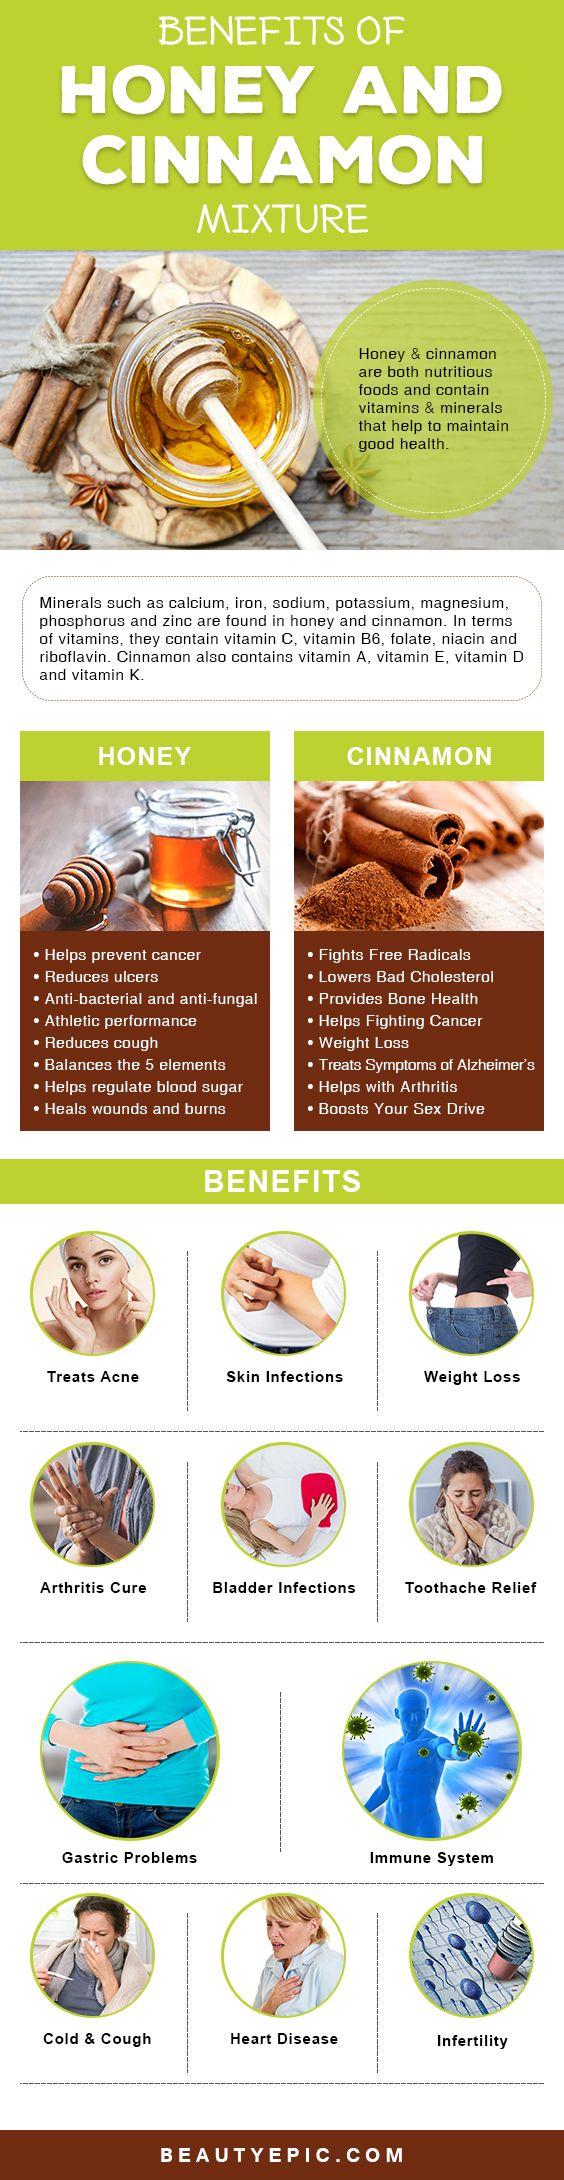 10 Health Benefits of Honey and Cinnamon Mixture